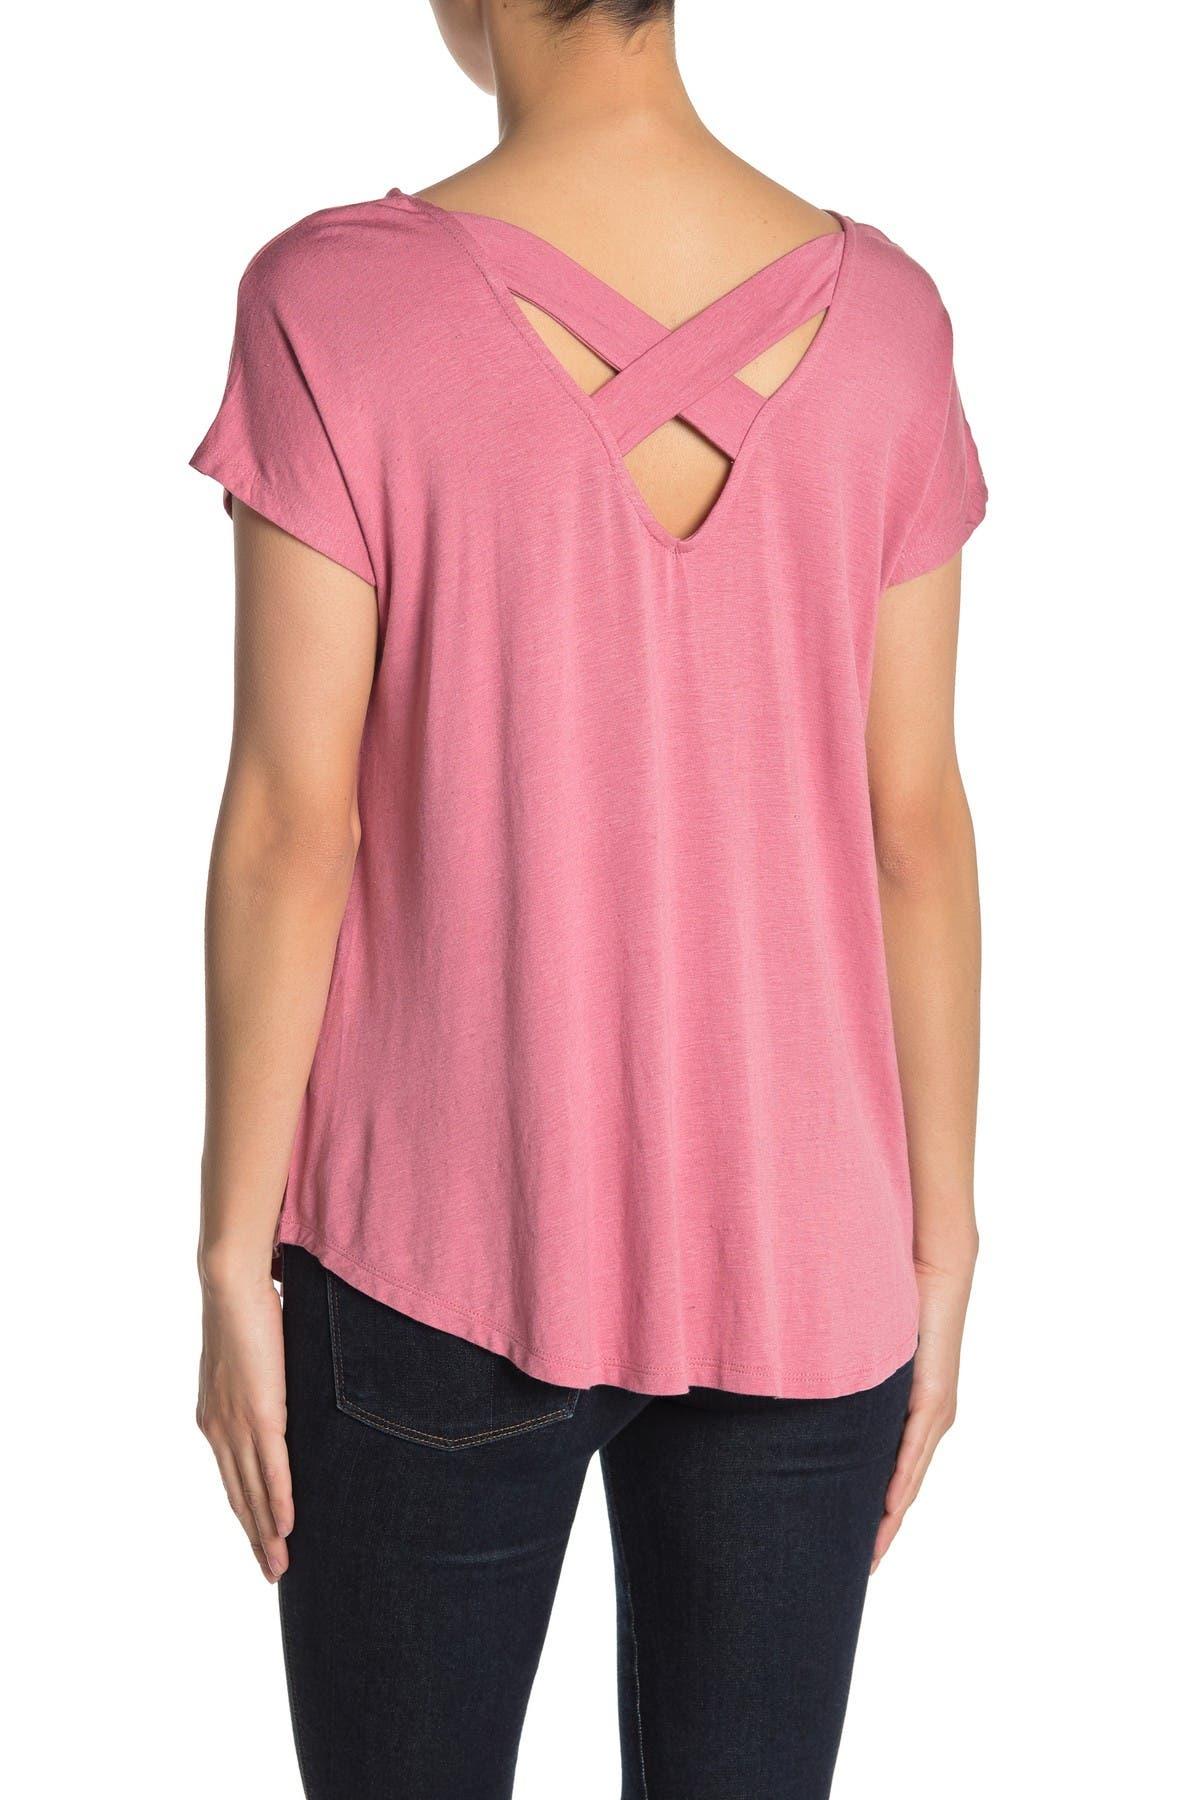 Image of Bobeau Crisscross Back T-Shirt